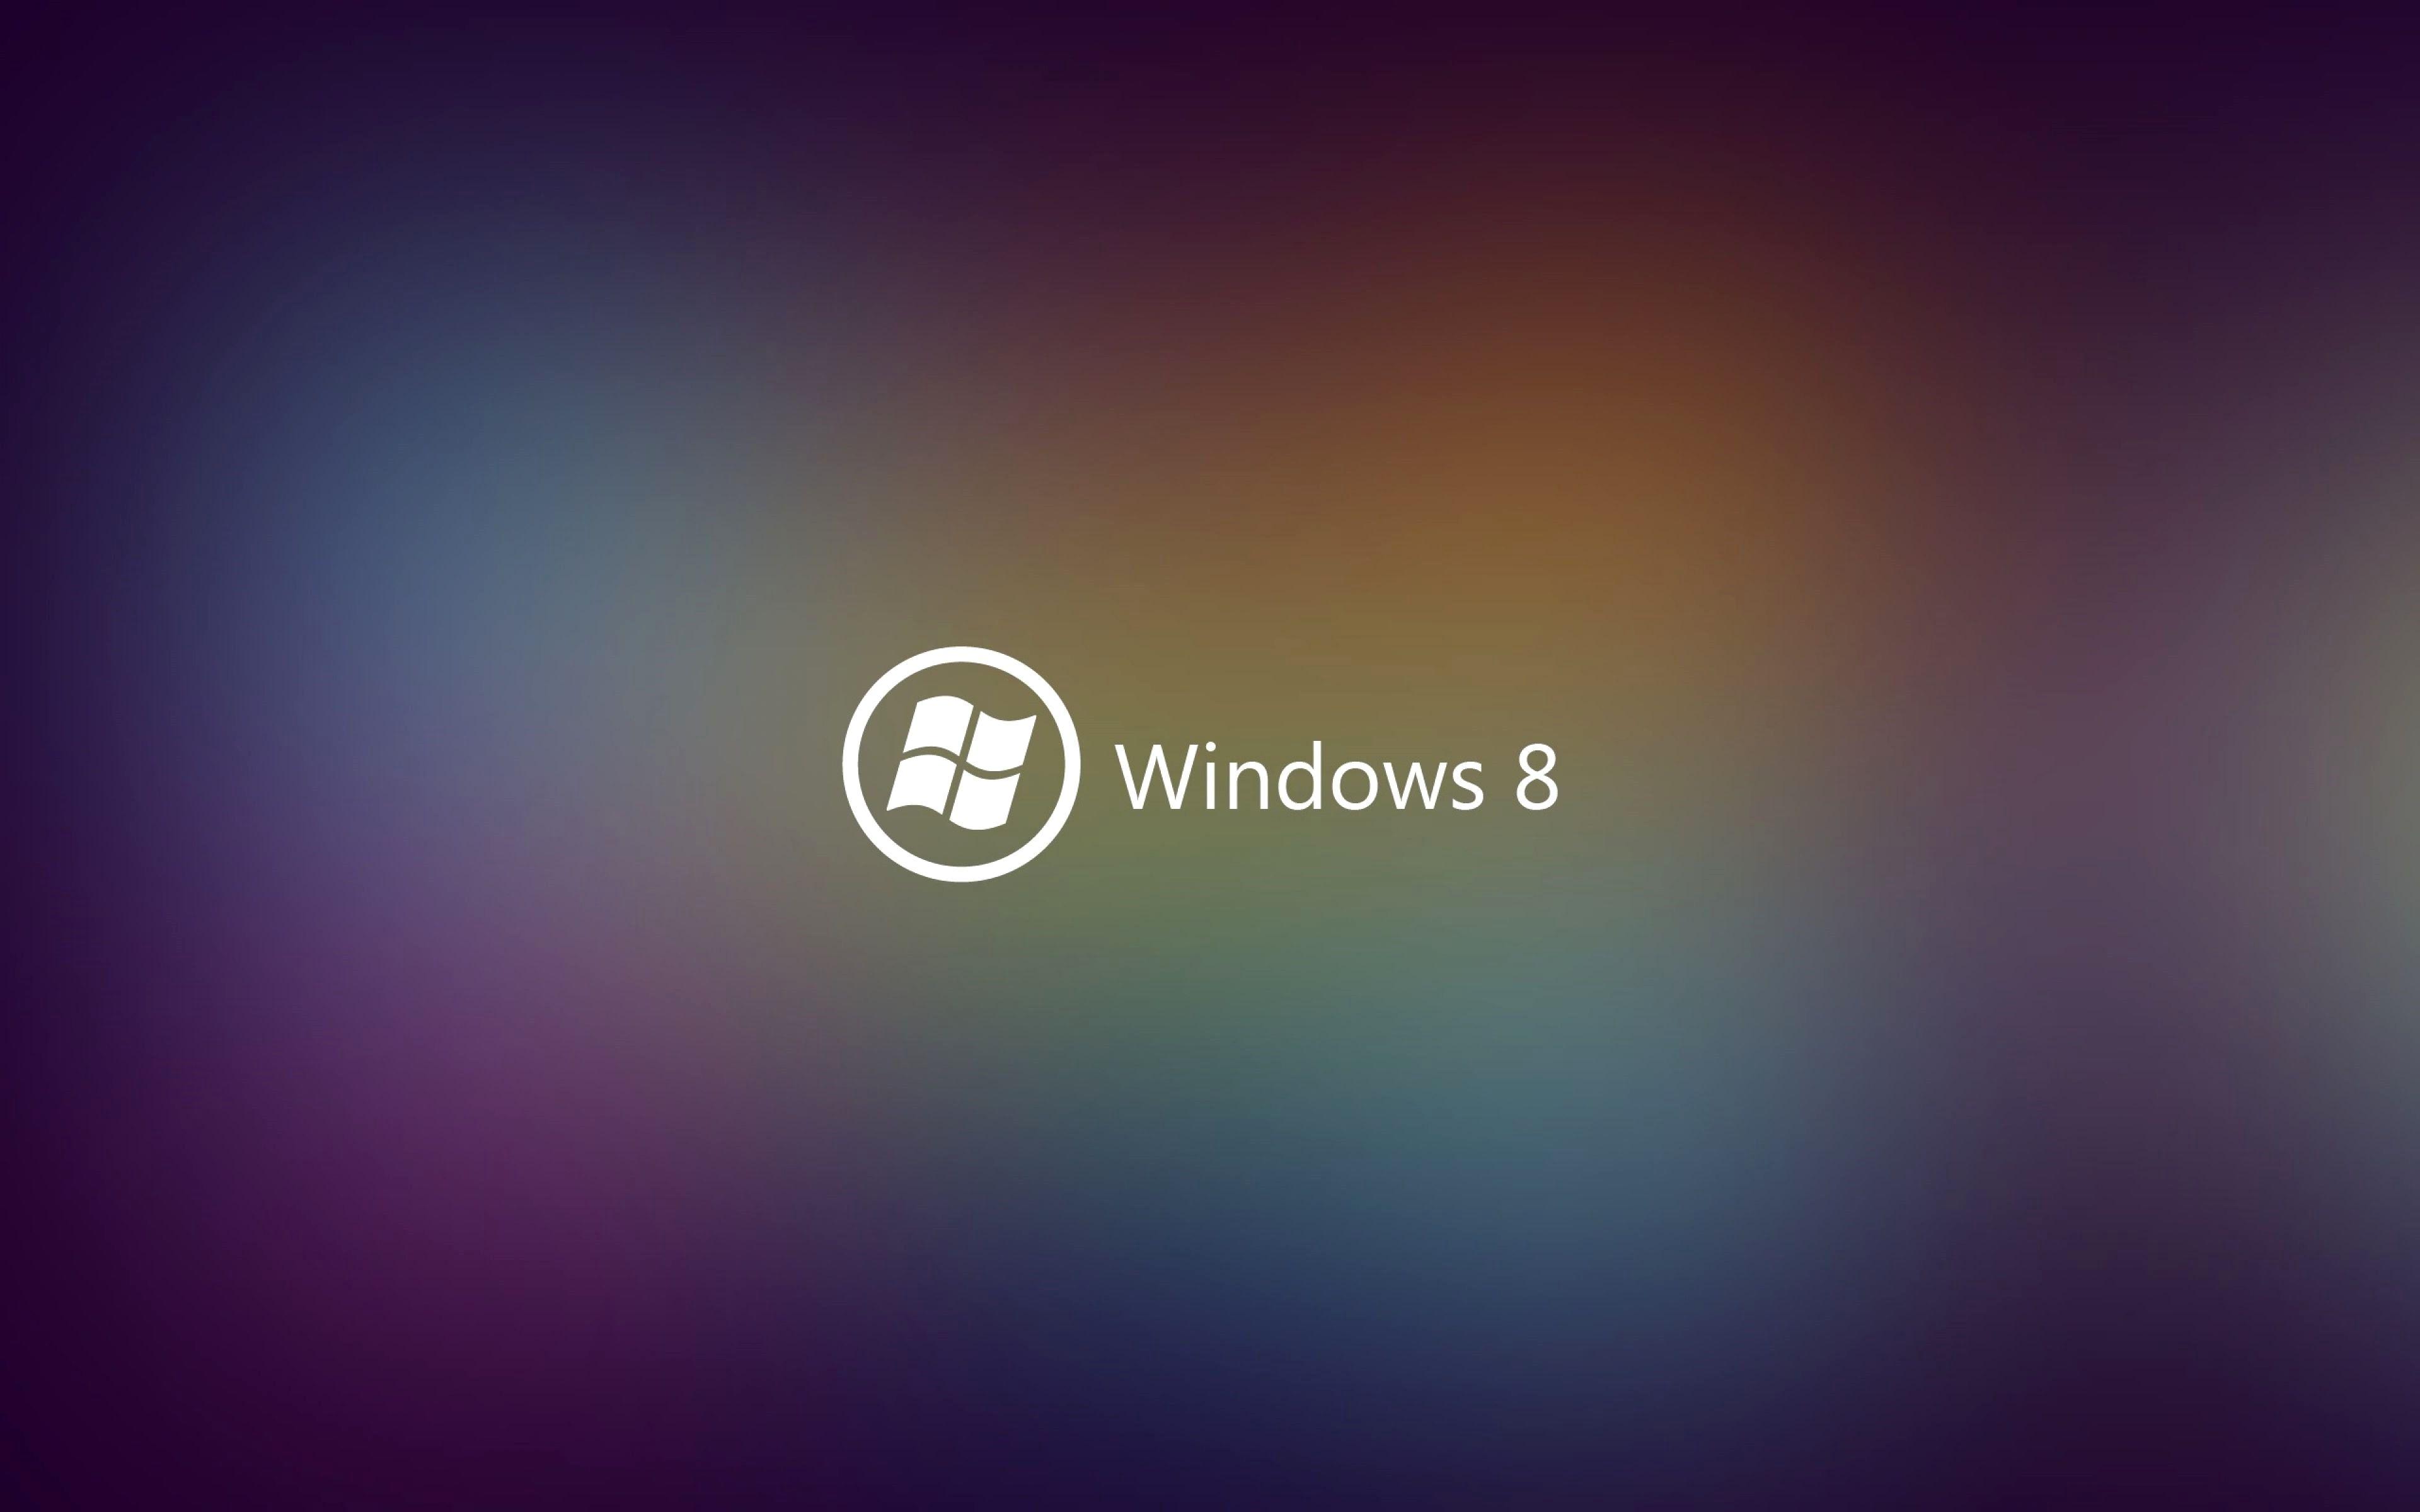 4k Wallpaper For Pc Windows 8 Ideas Wallpaper Pc 4k Wallpapers For Pc Windows Wallpaper